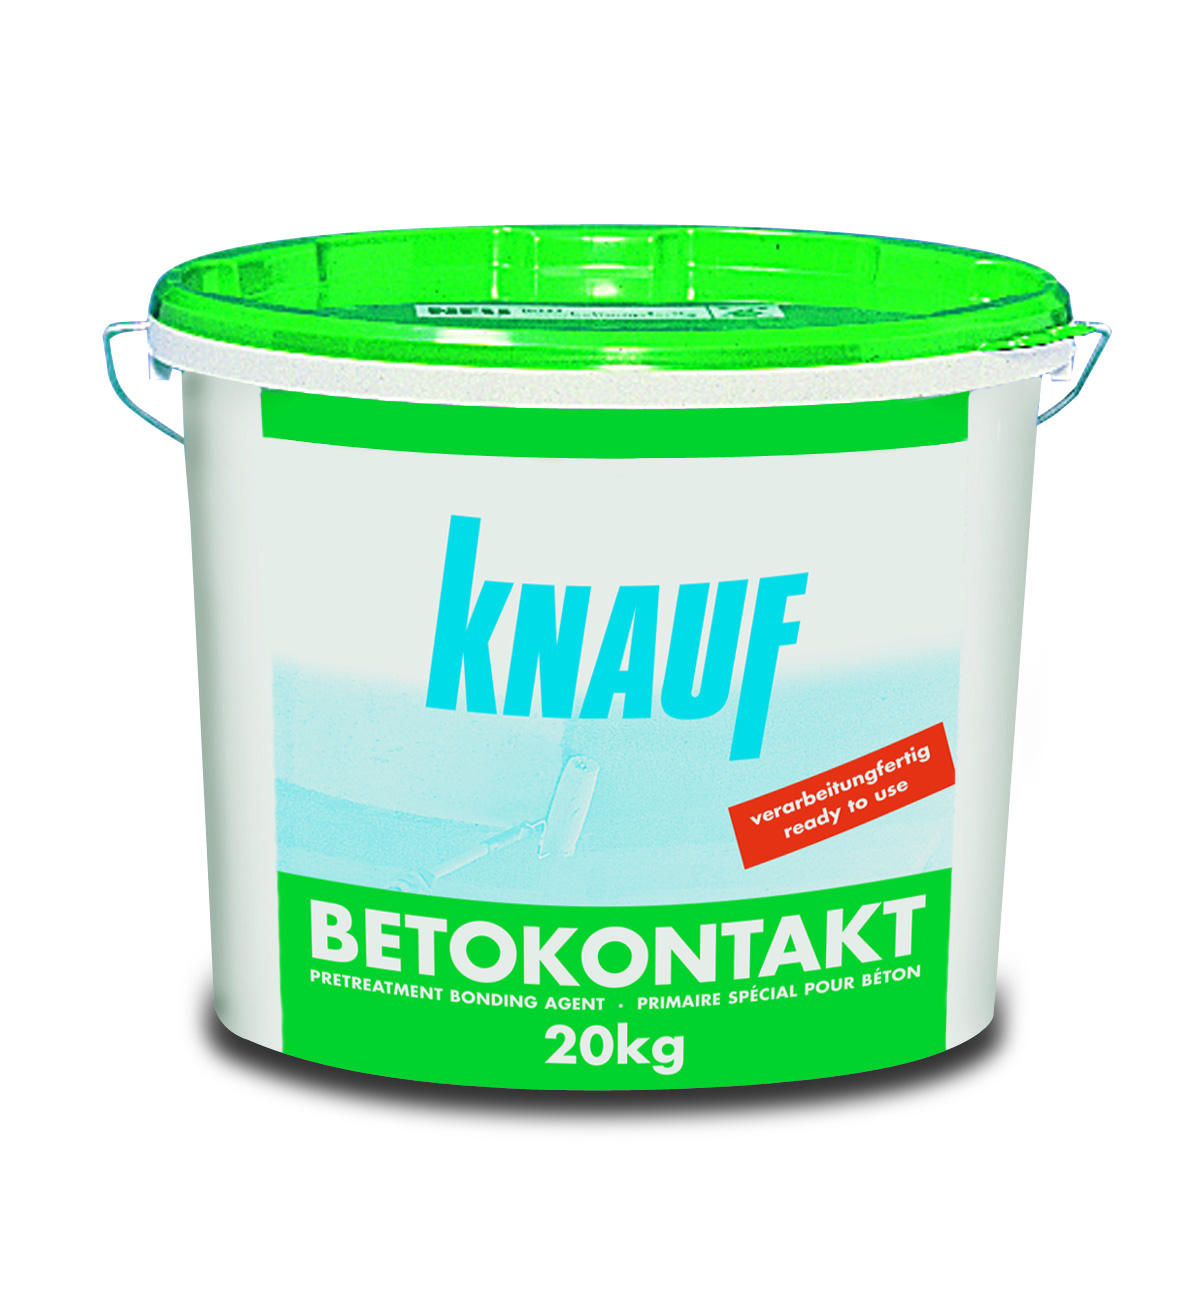 KNAUFF Betokontakt cena za 20 kg